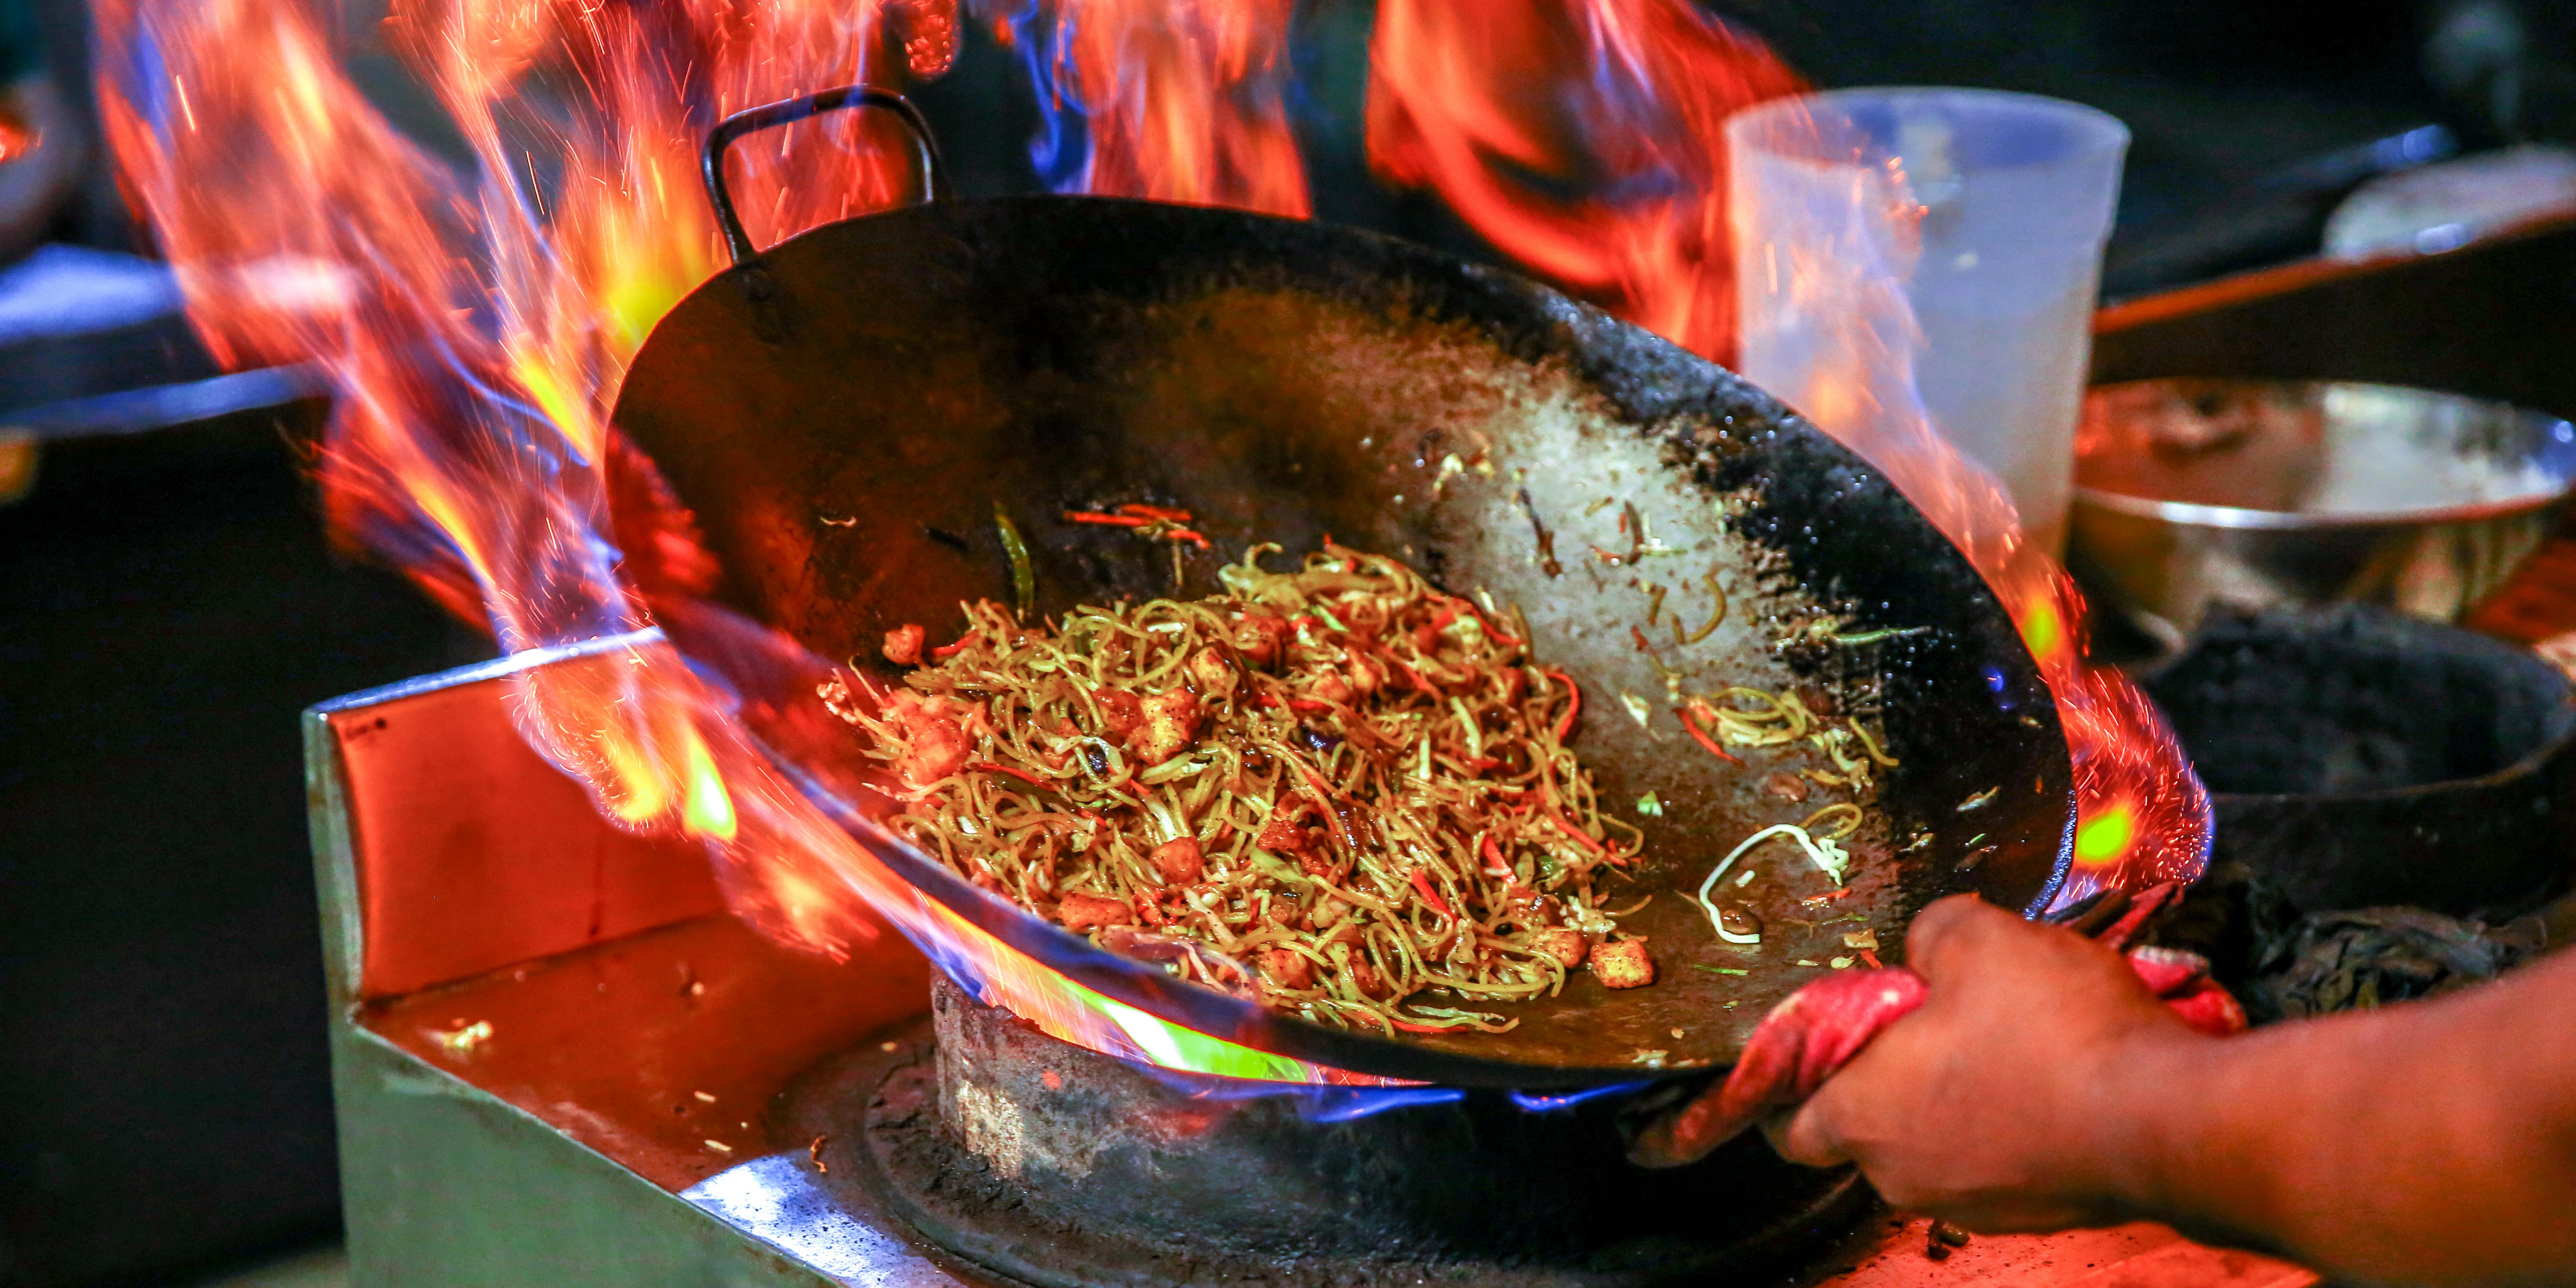 Olive oil Asian cuisine